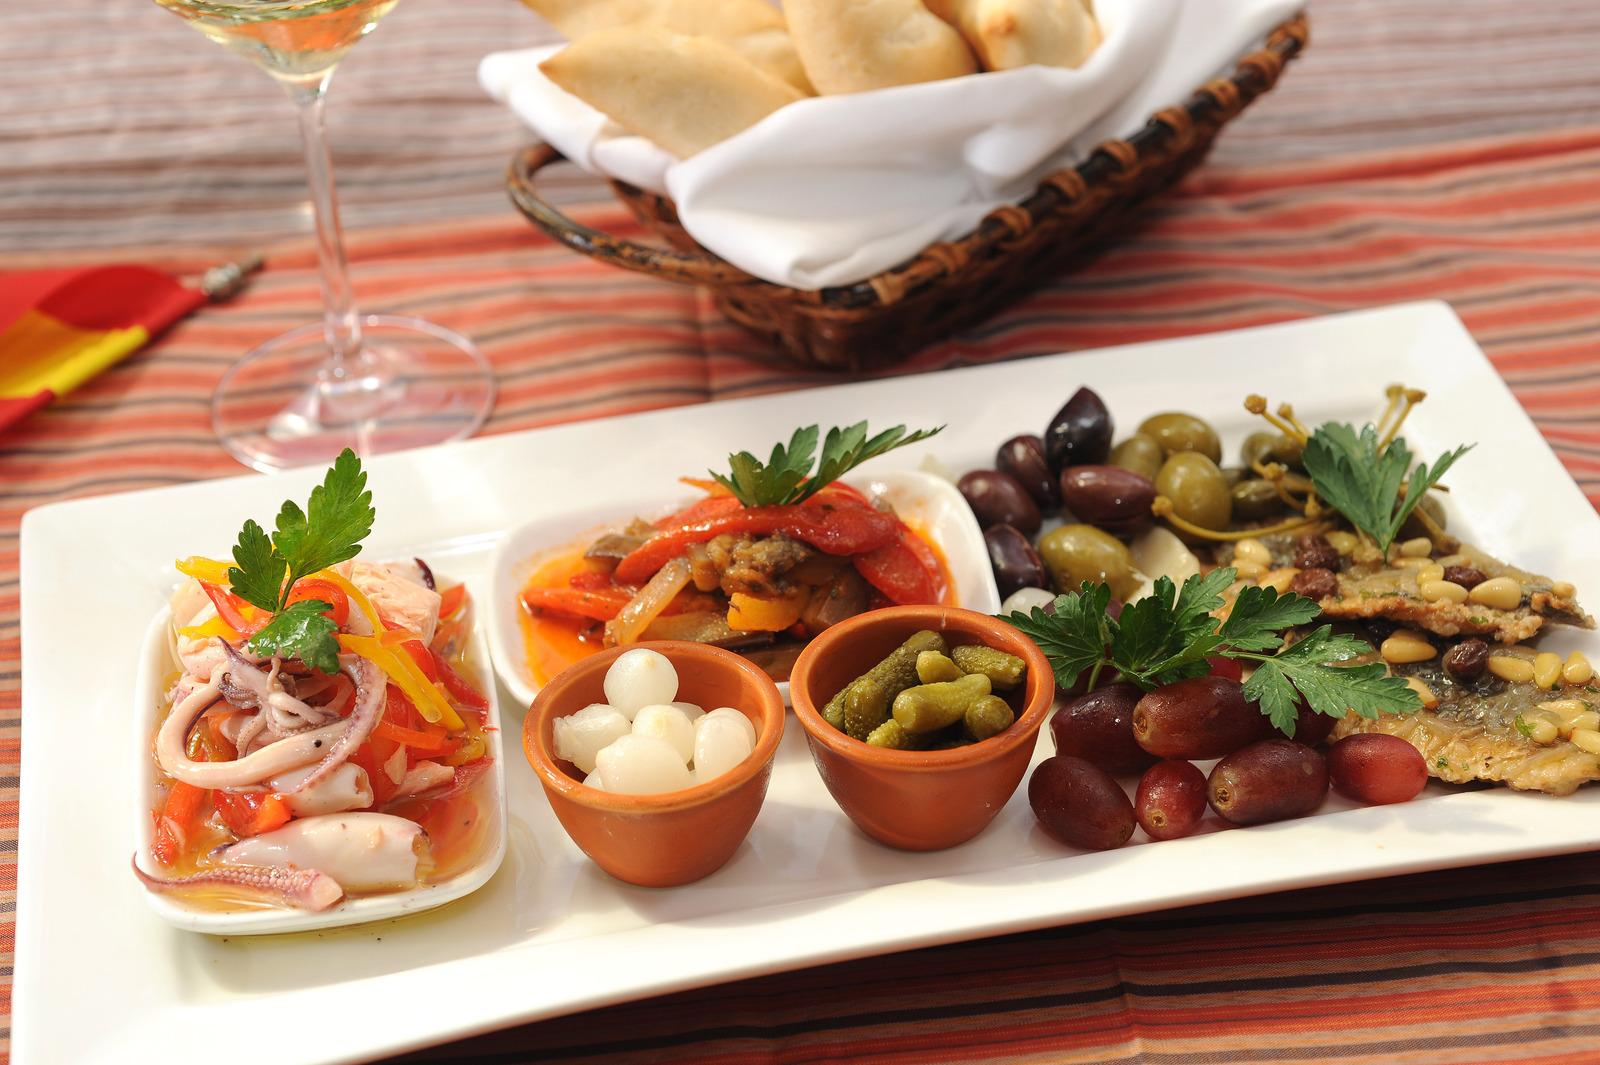 A dish at a tapas bar from tapas in Spain